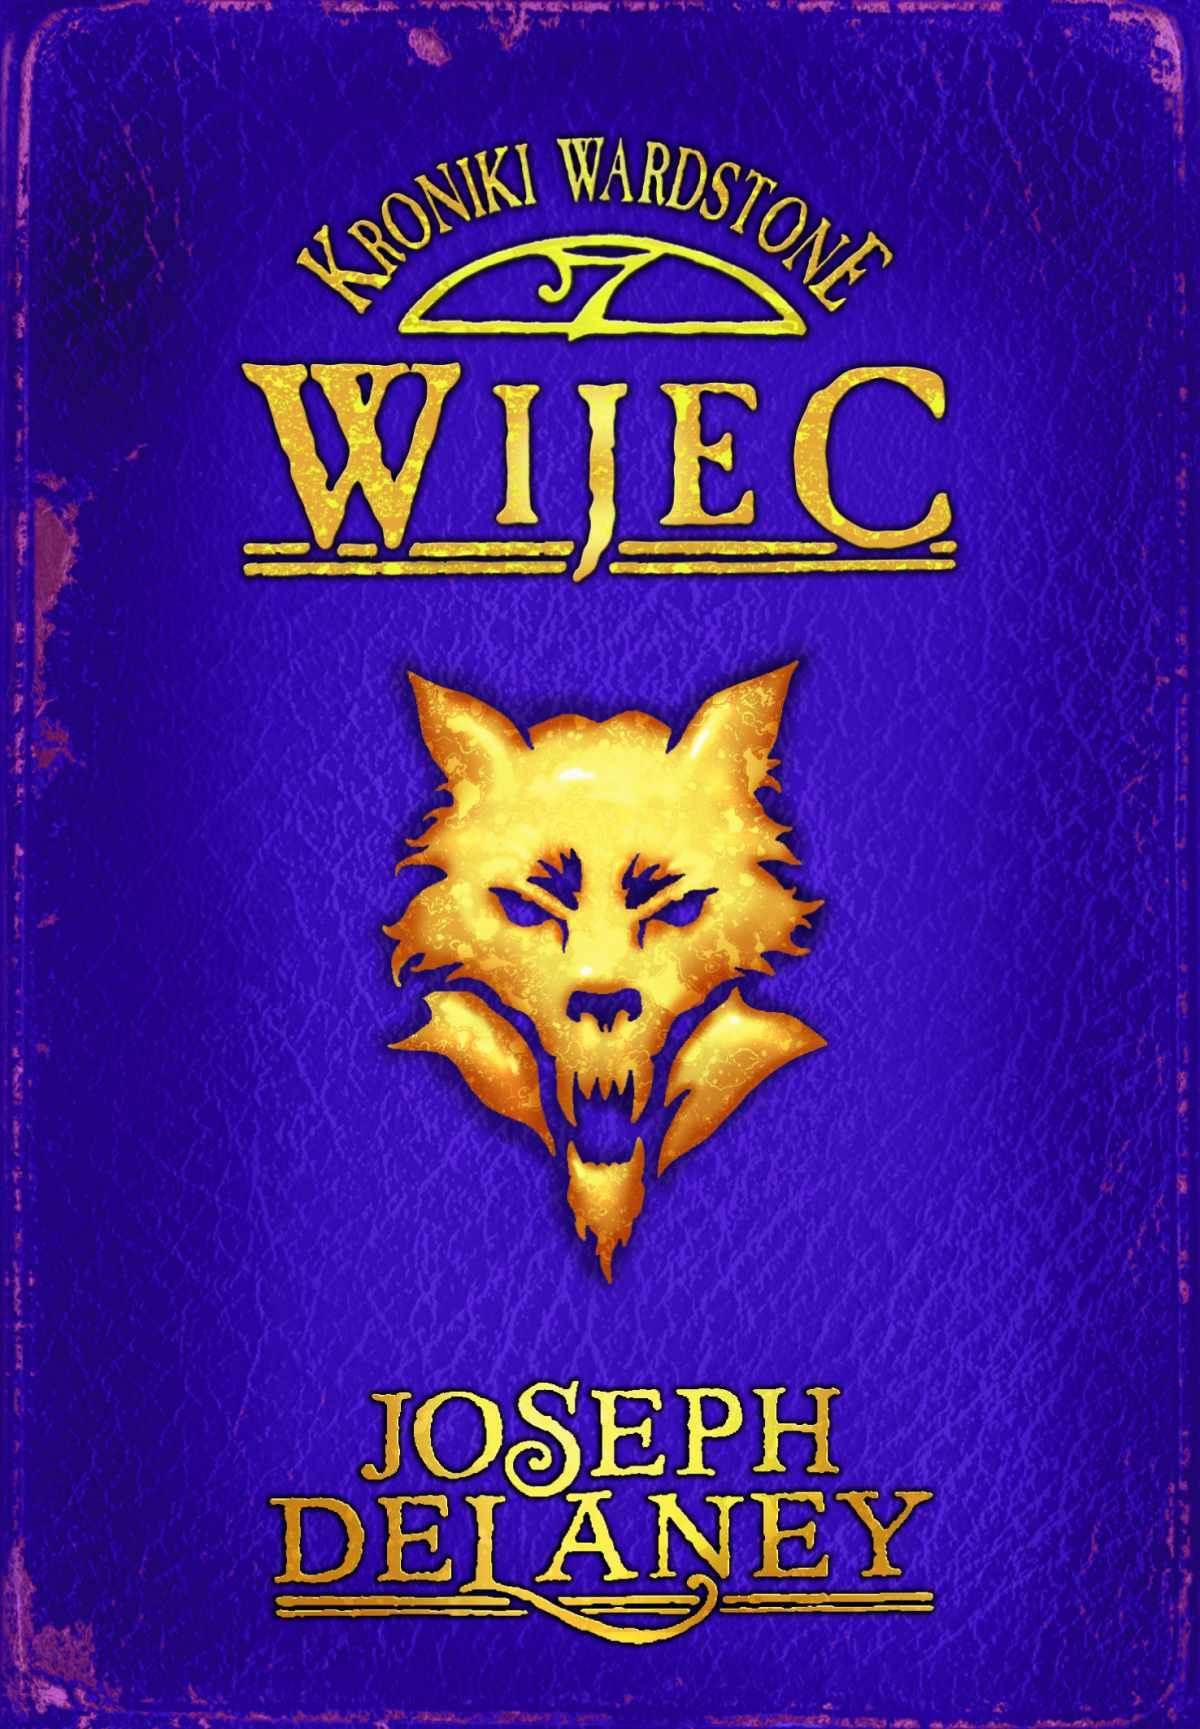 Kroniki Wardstone 11. Wijec - Ebook (Książka na Kindle) do pobrania w formacie MOBI